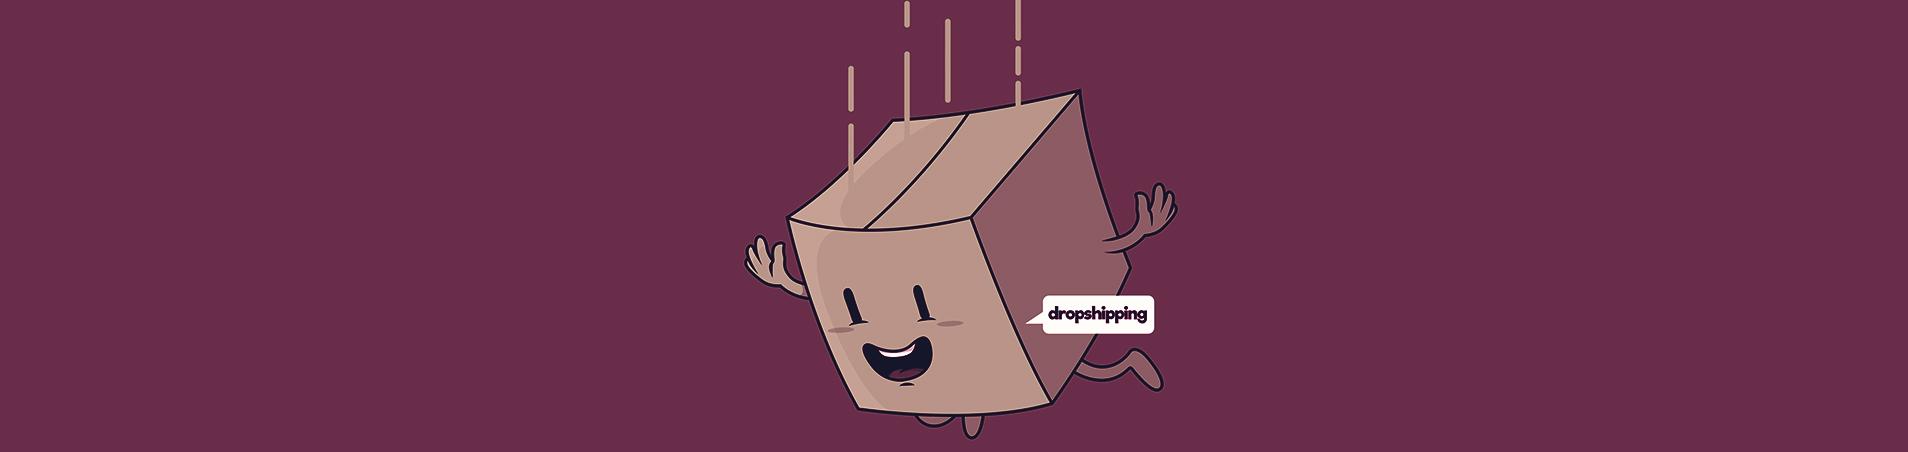 dropshipping article blog